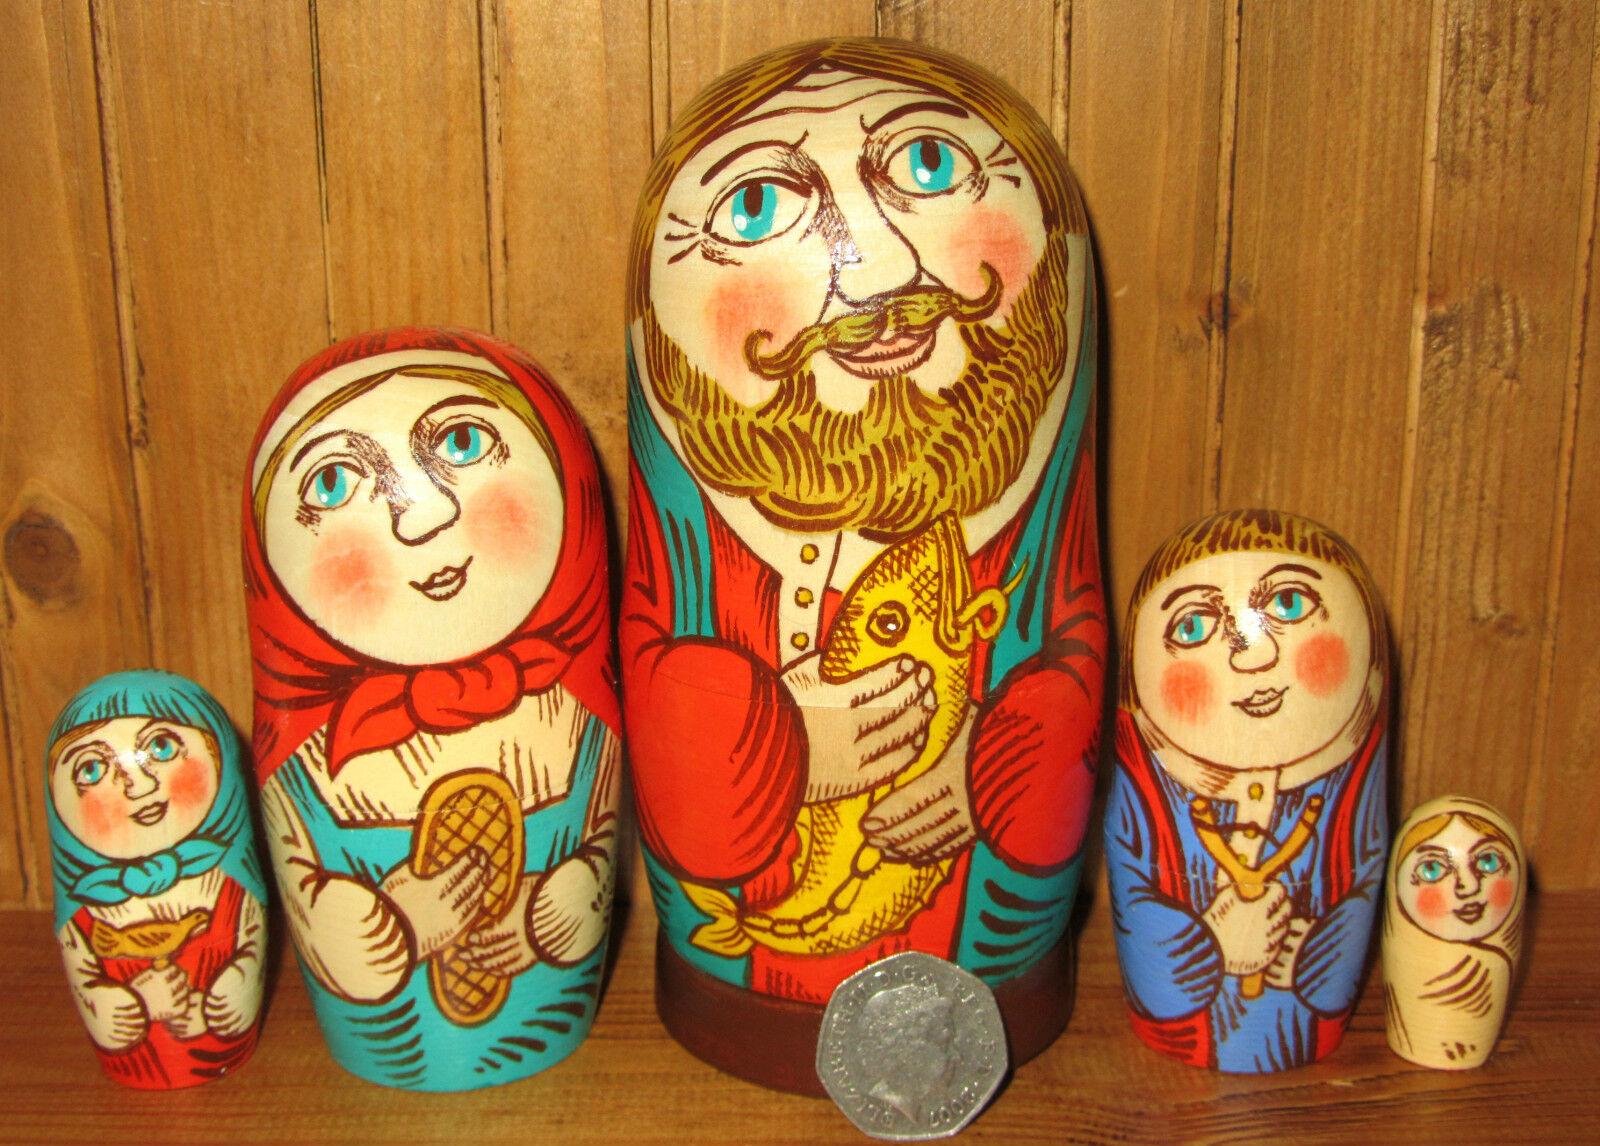 Nidificazione Bambola Russa Matryoshka Family 5 artista MADE  Mercato  PAPA 'e pesci firmato